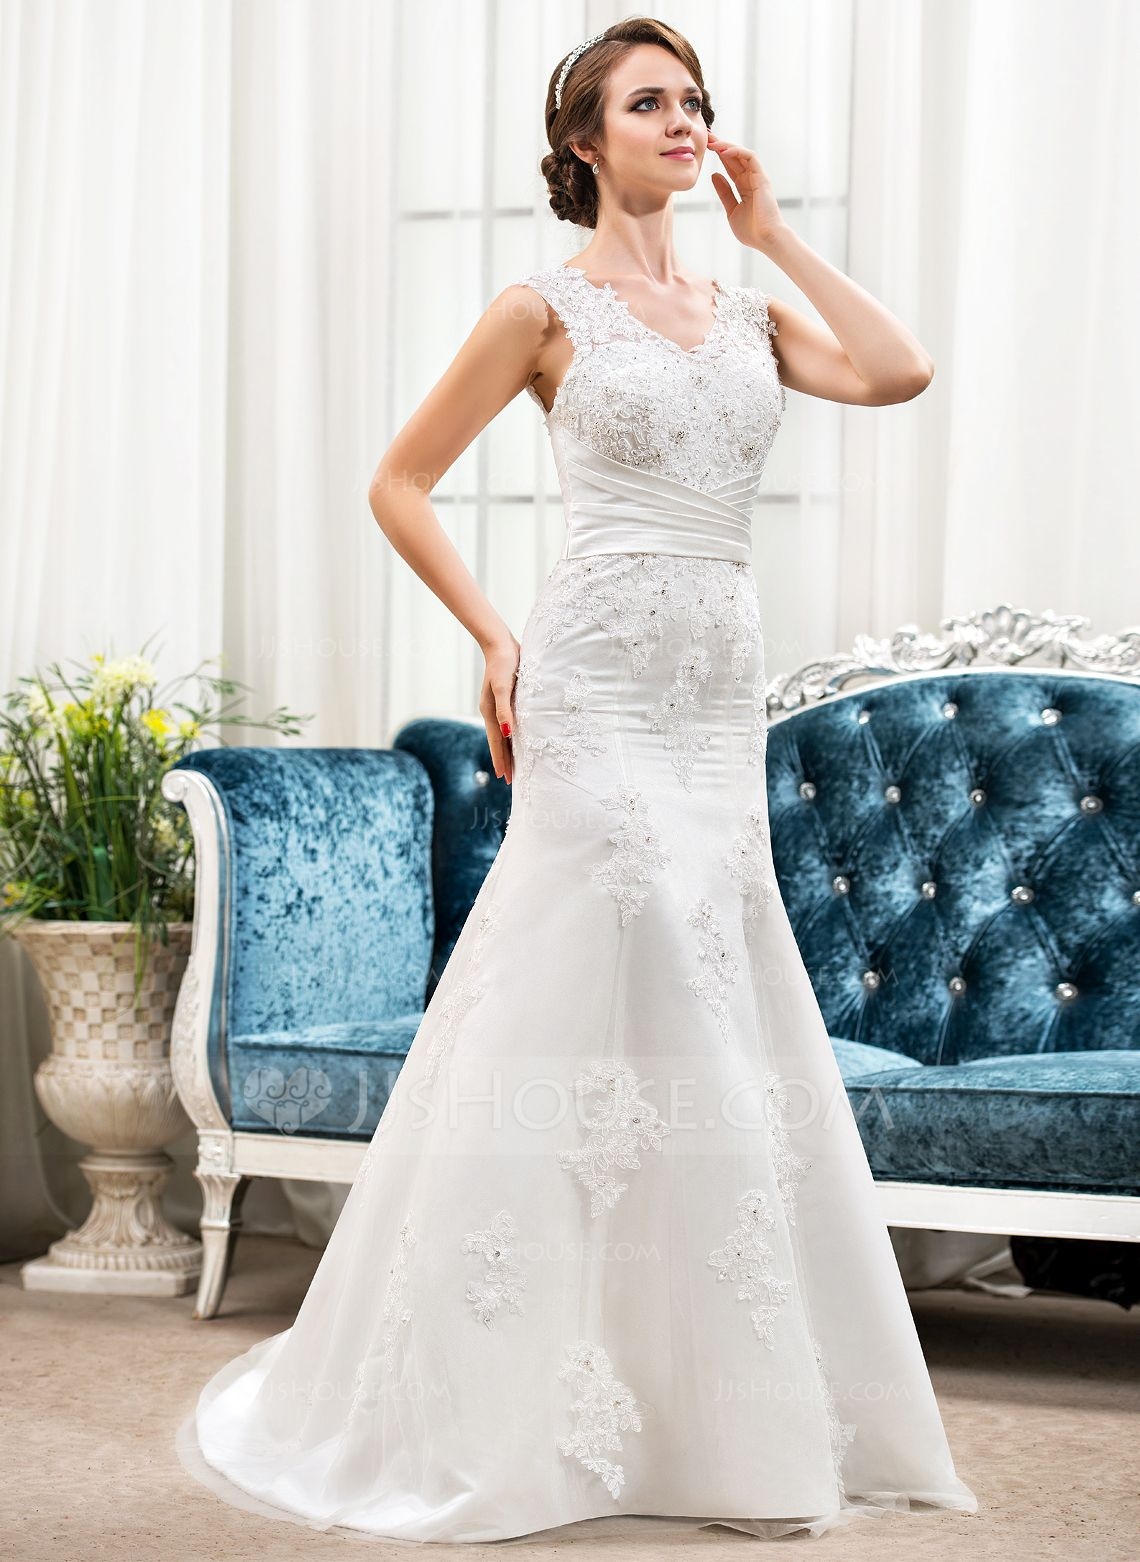 Trumpetmermaid vneck sweep train lace wedding dress with ruffle